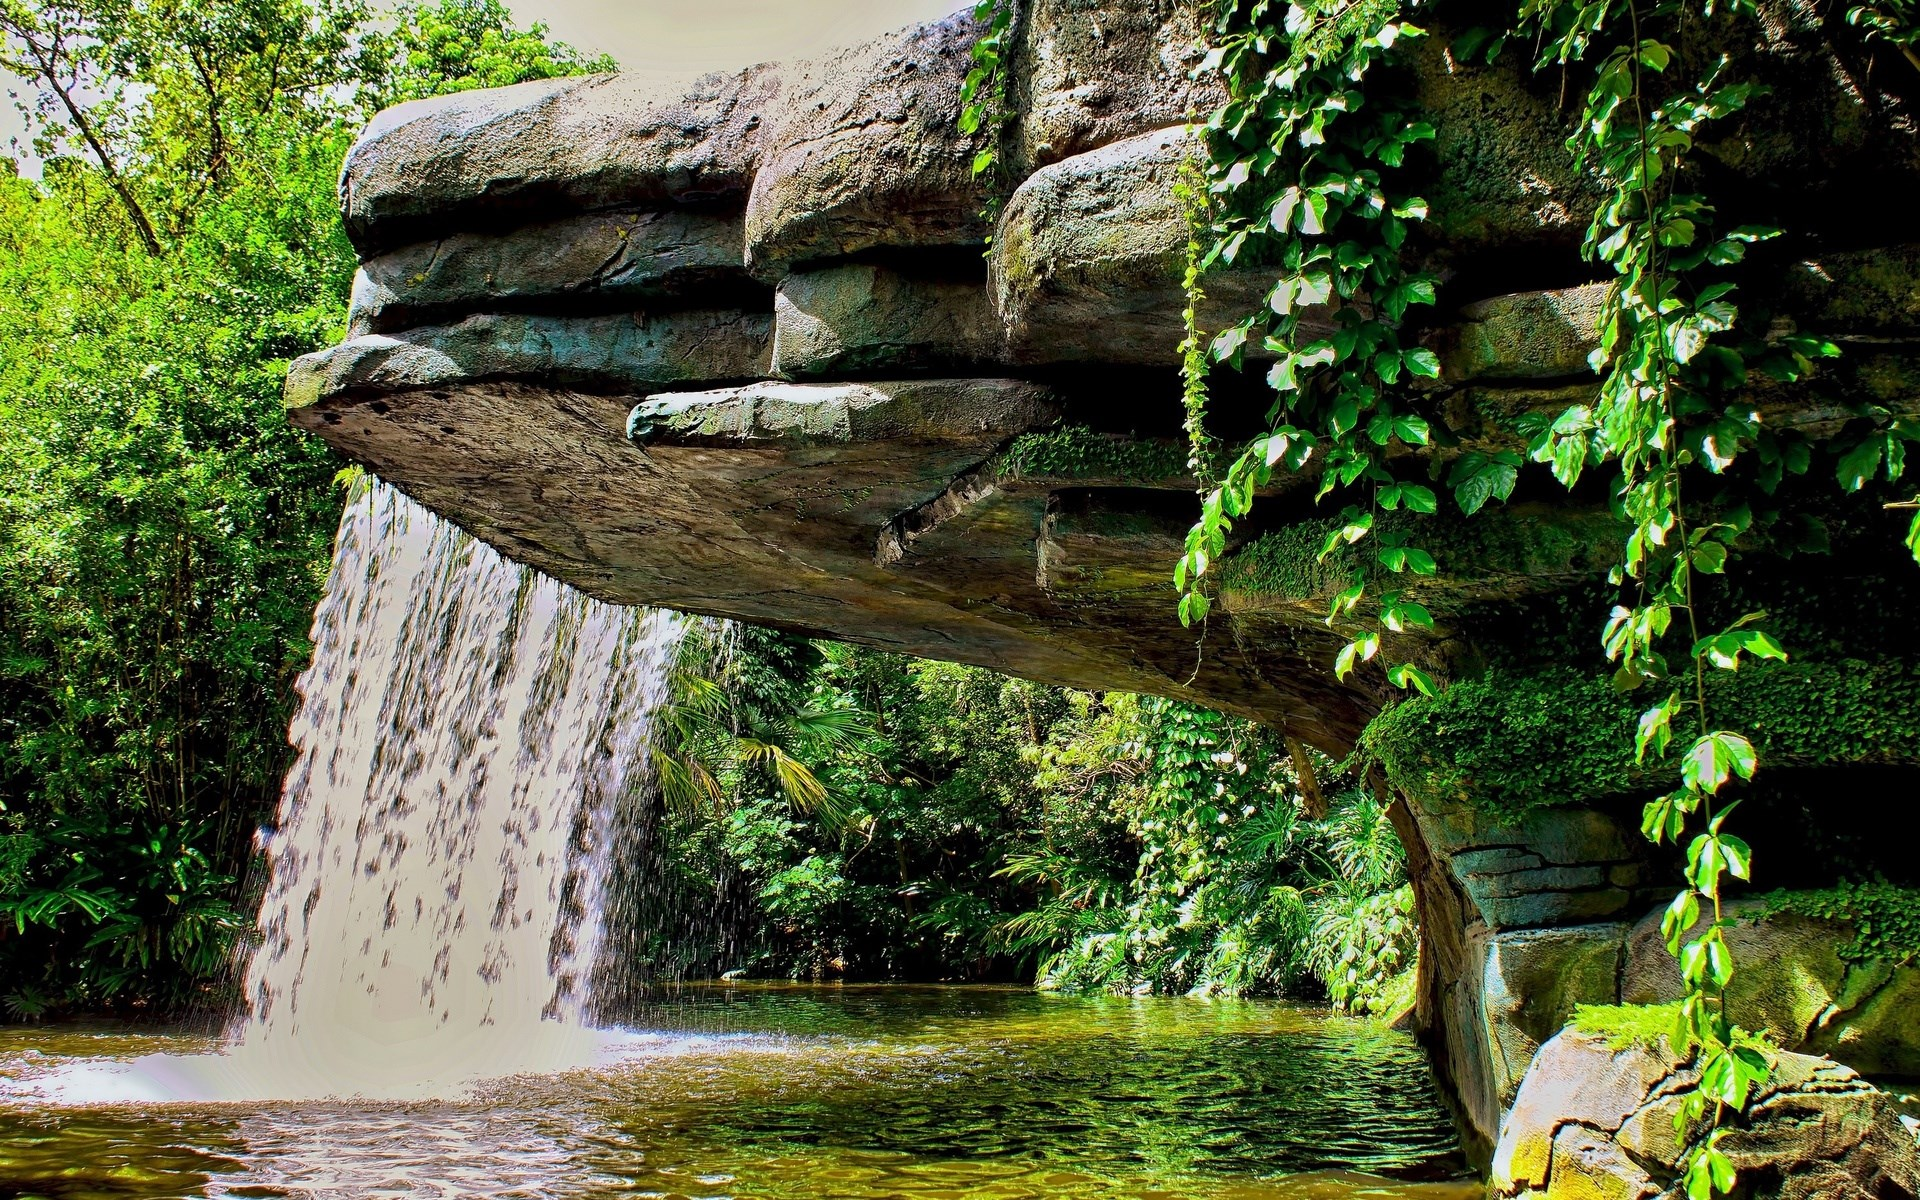 Fall Wallpaper For Windows 10 Waterfall Pond Vegetation Landscape 1920 X 1200